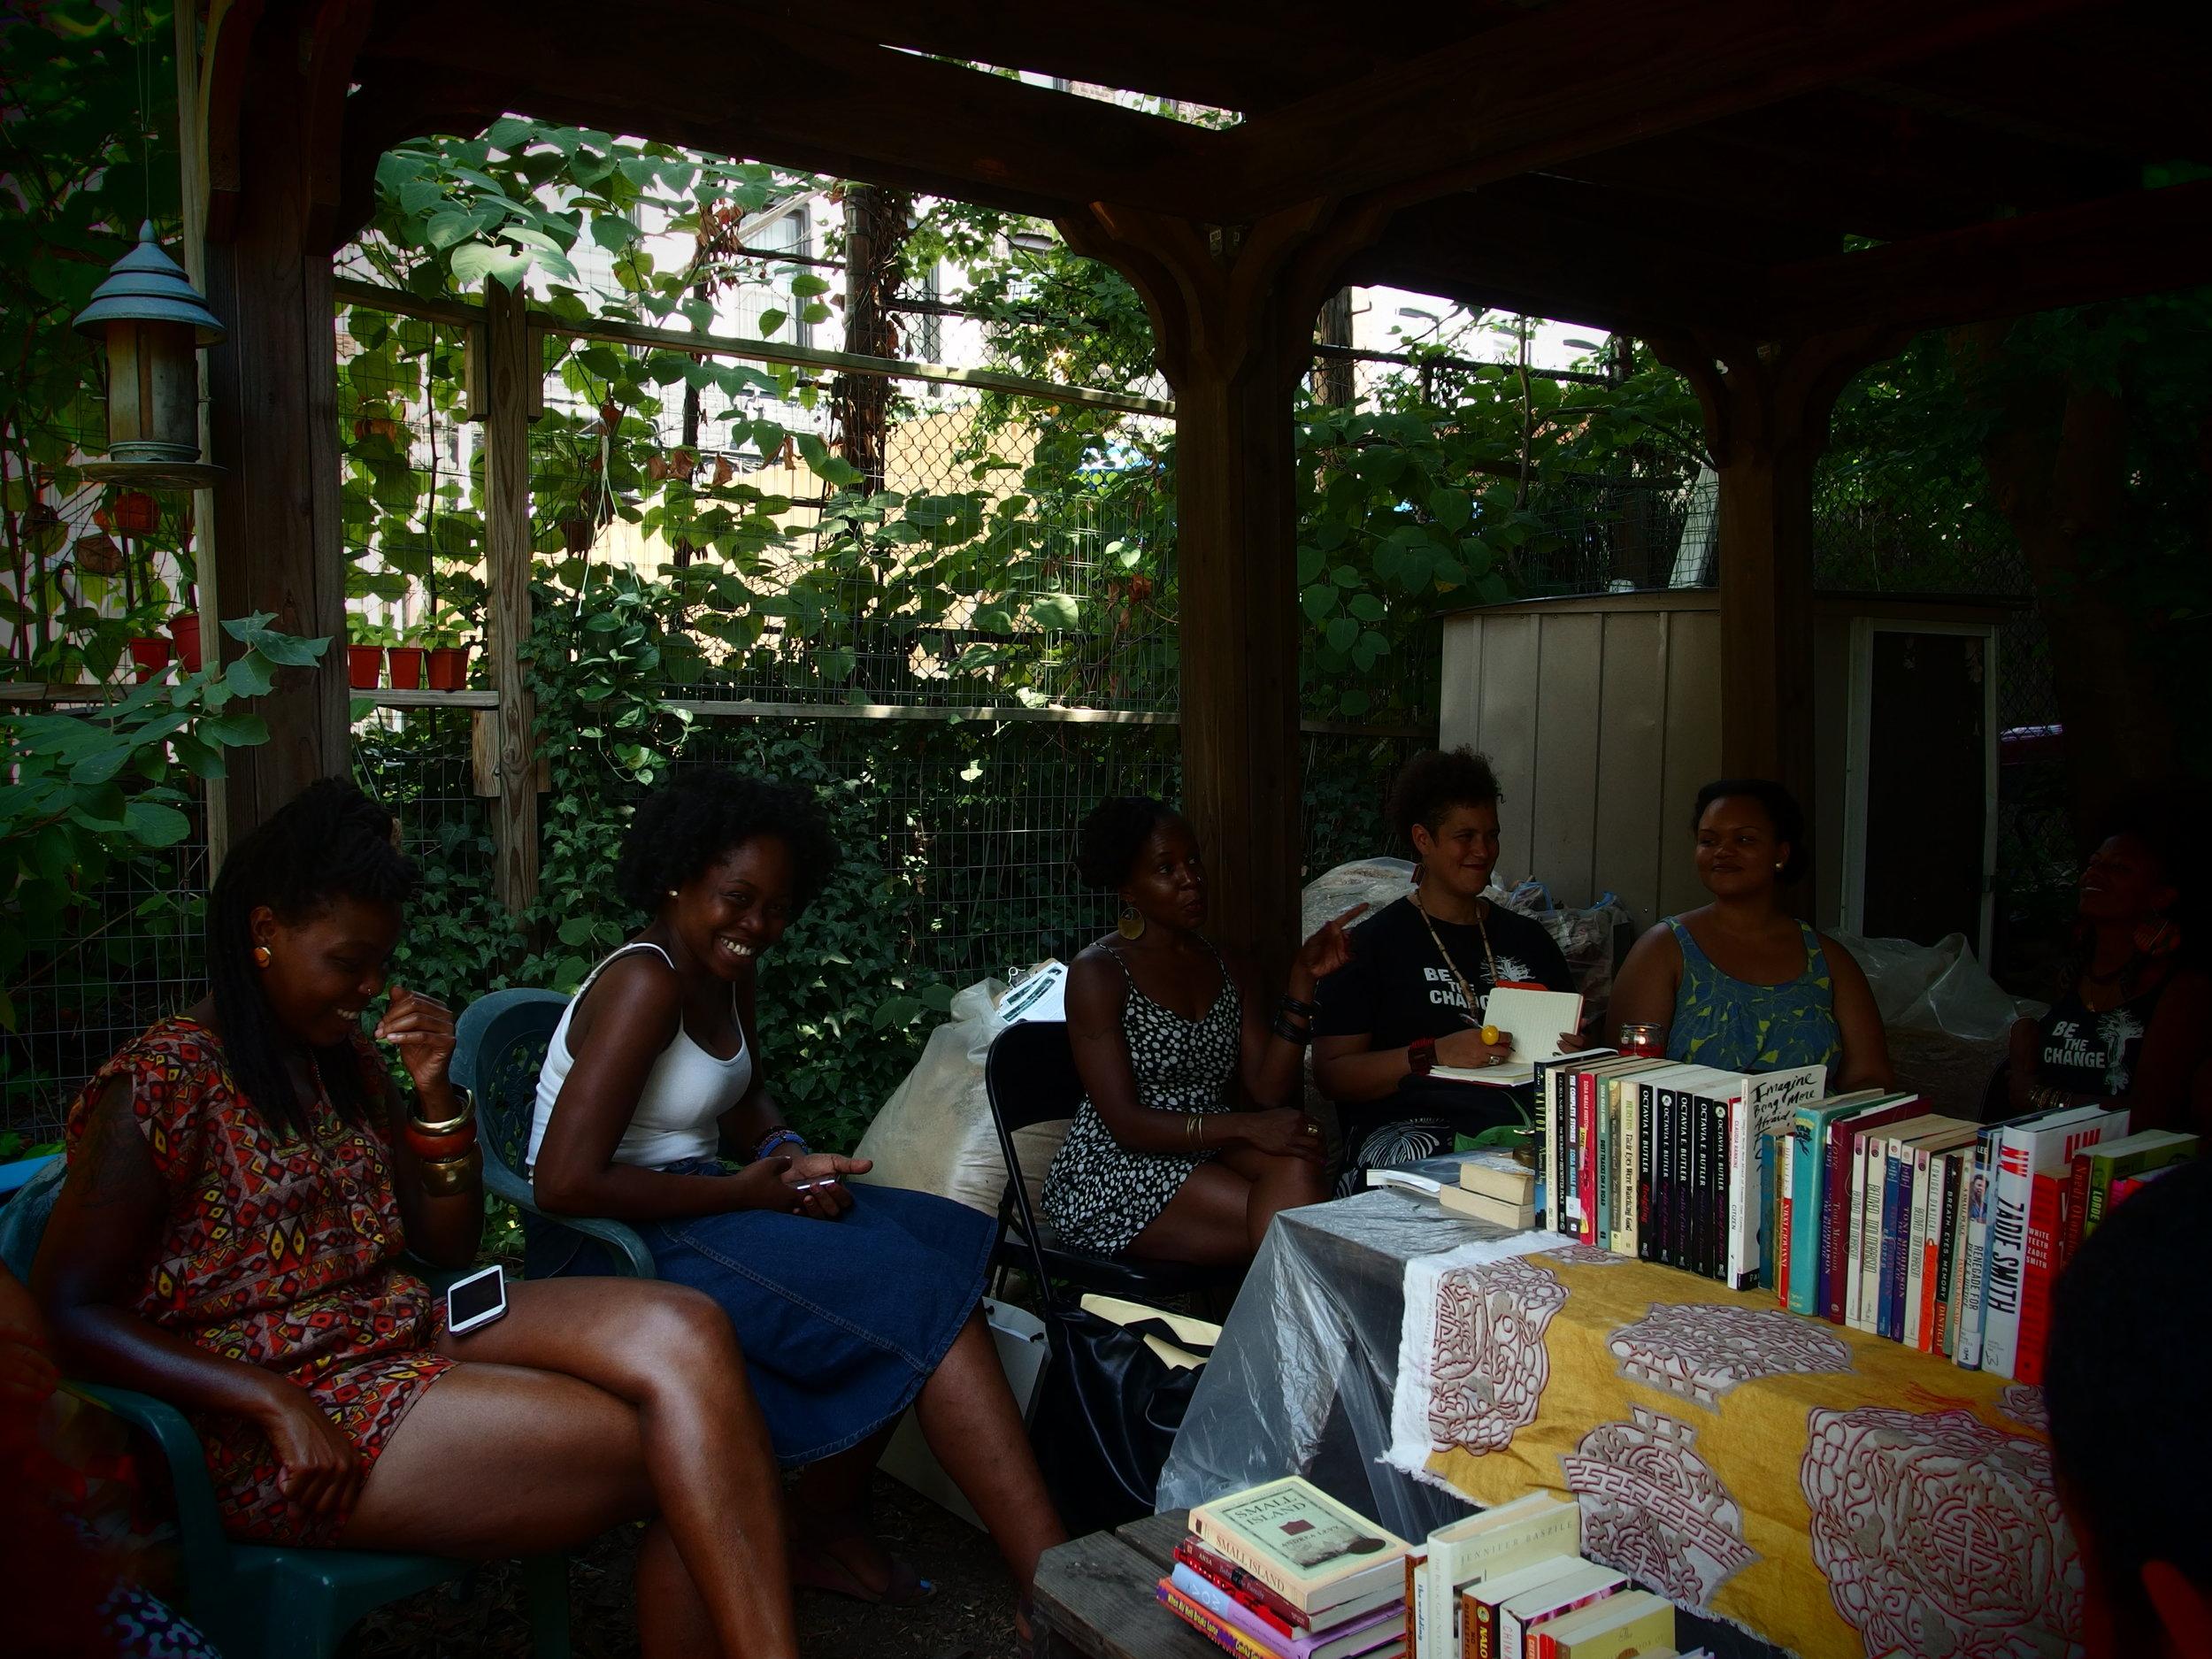 little-free-black-womens-library_20763181198_o.jpg